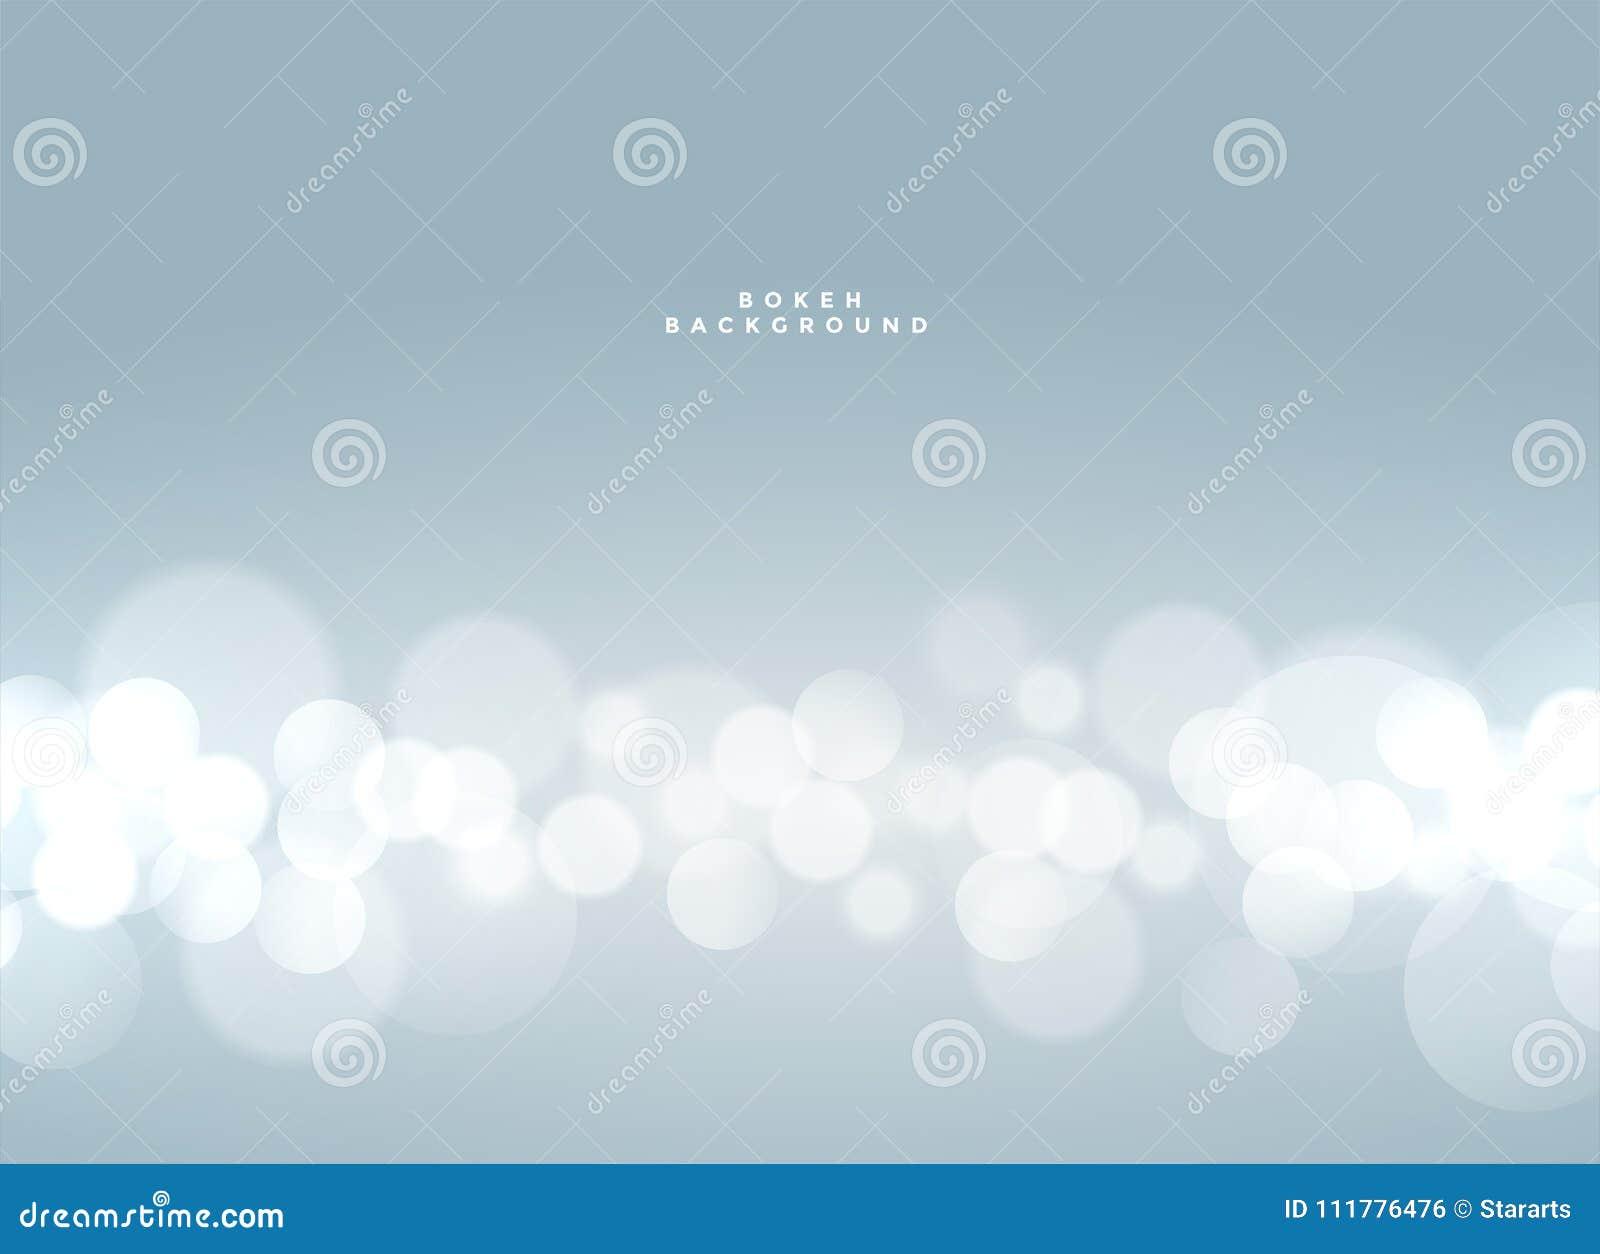 soft blue bokeh defocused light effect background